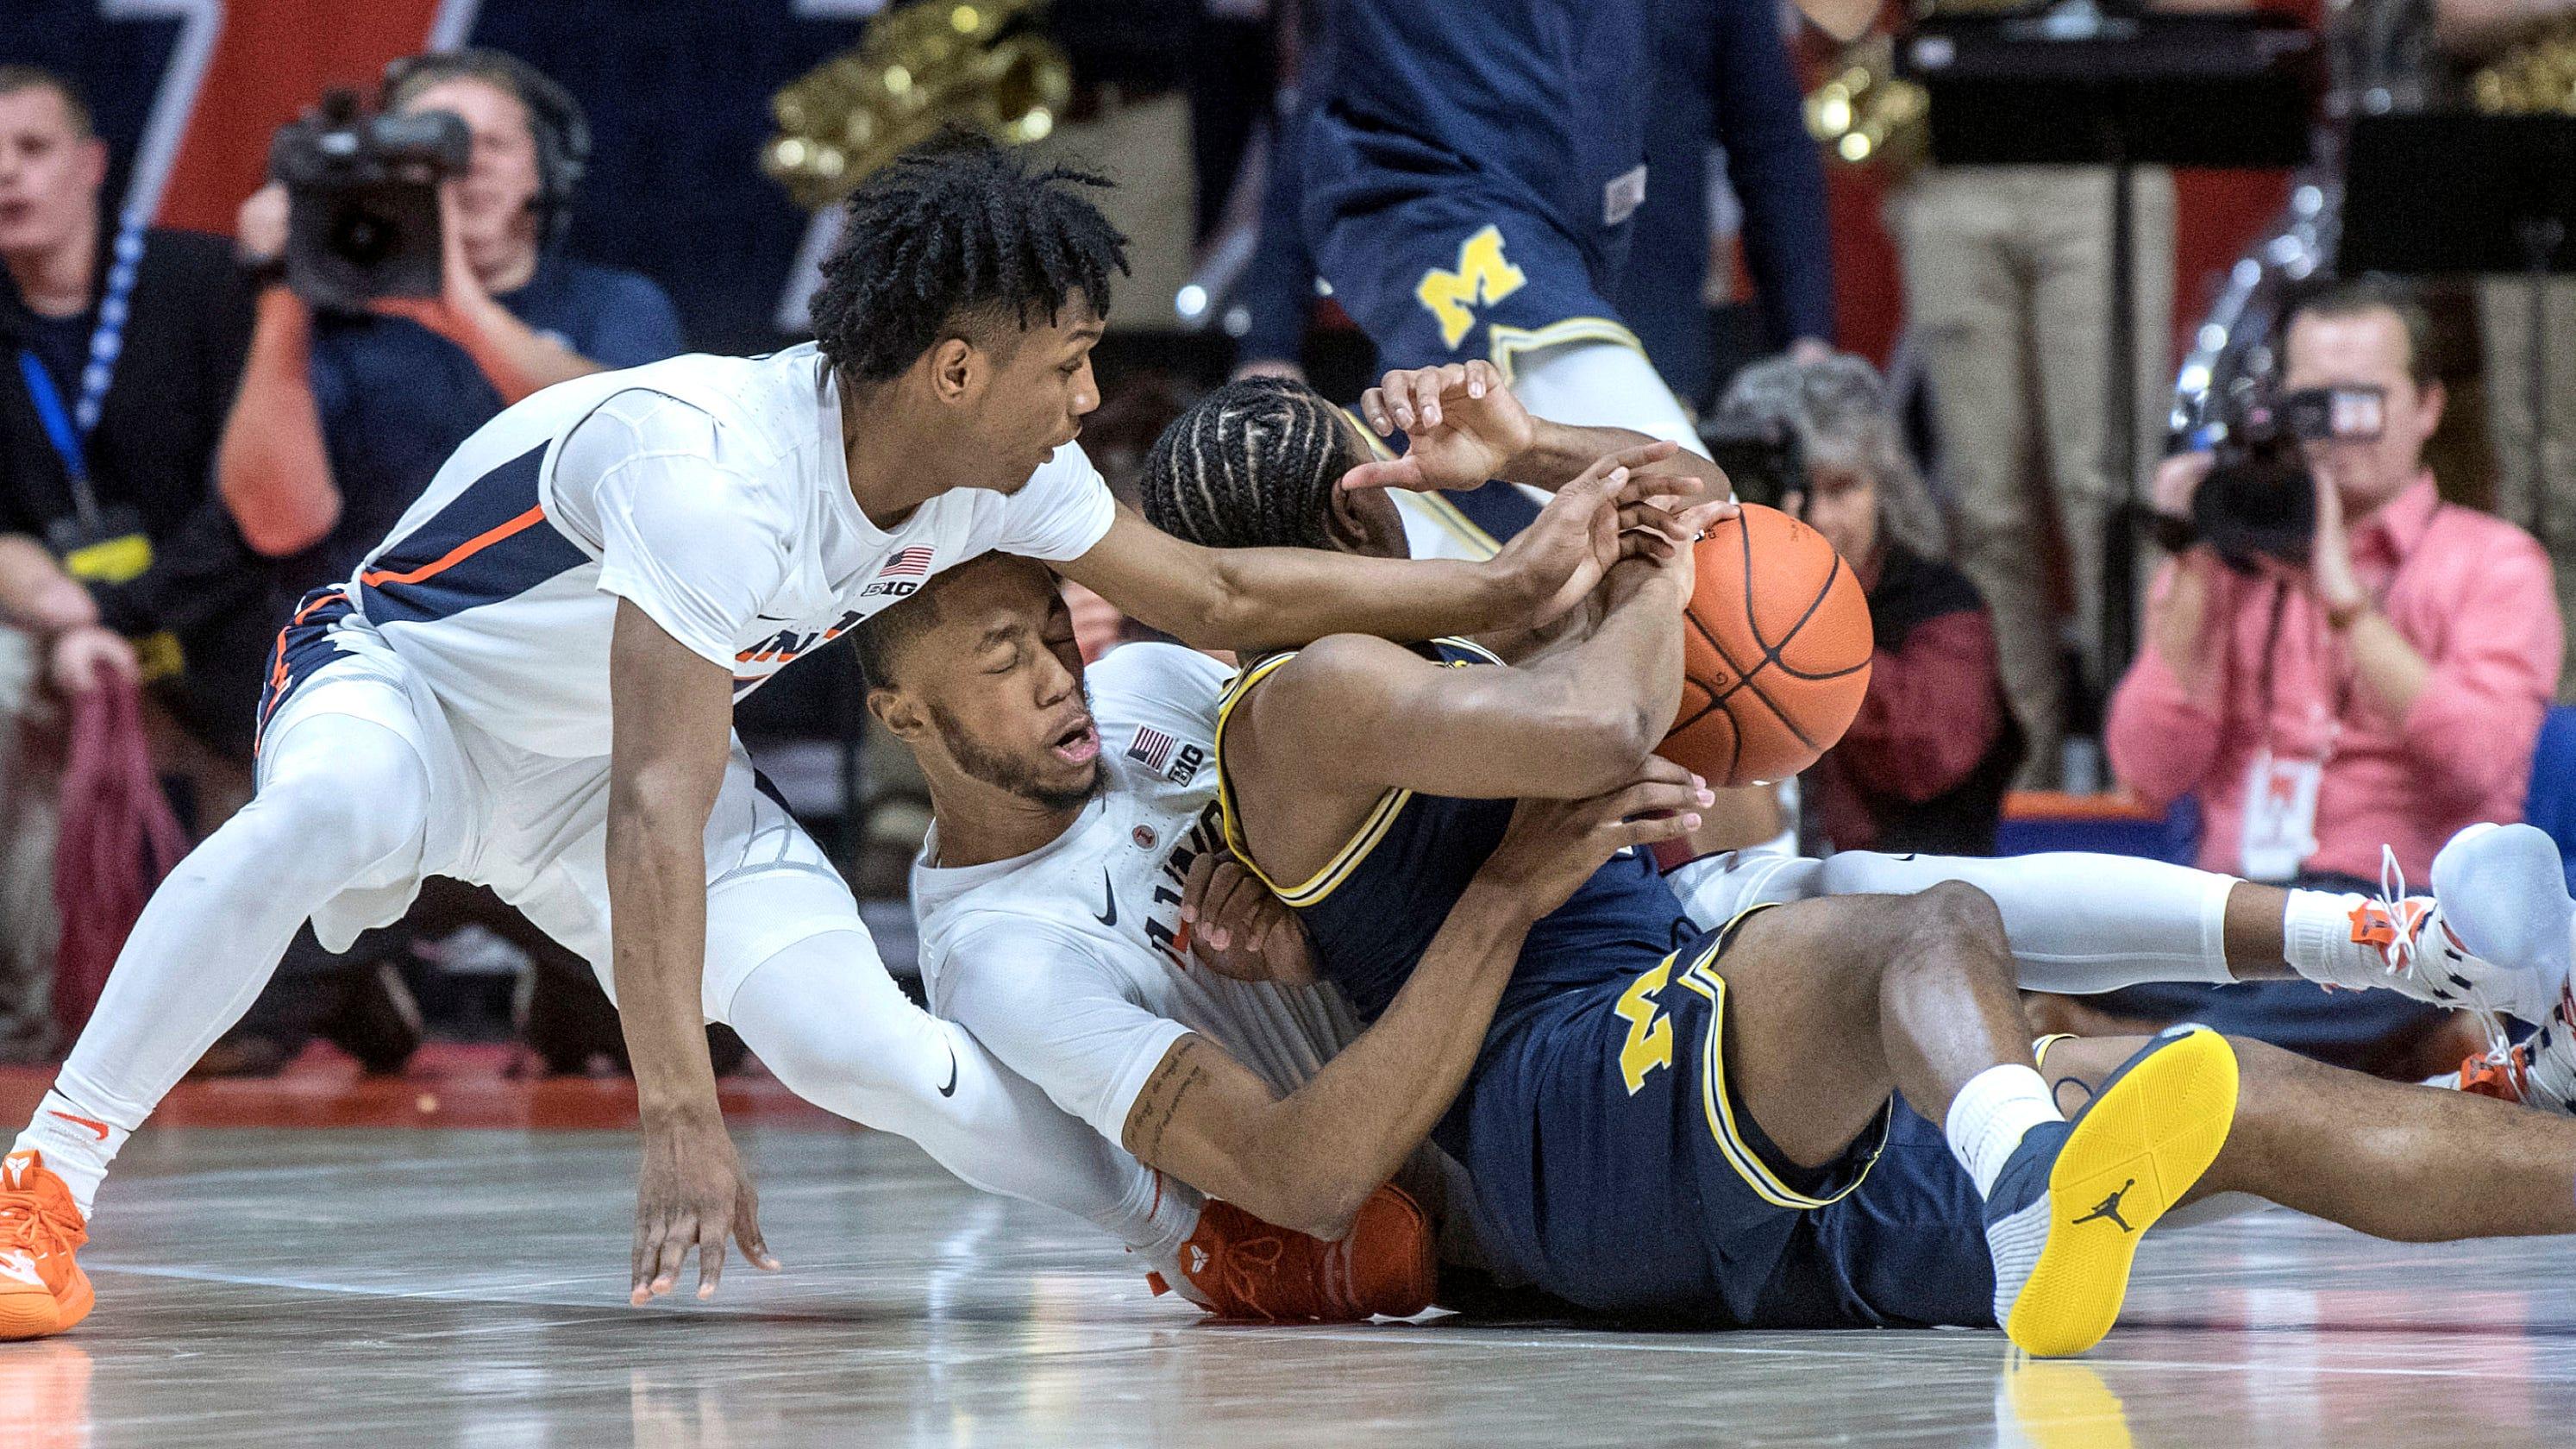 Michigan Basketball 79, Illinois Fighting Illini 69: Photos